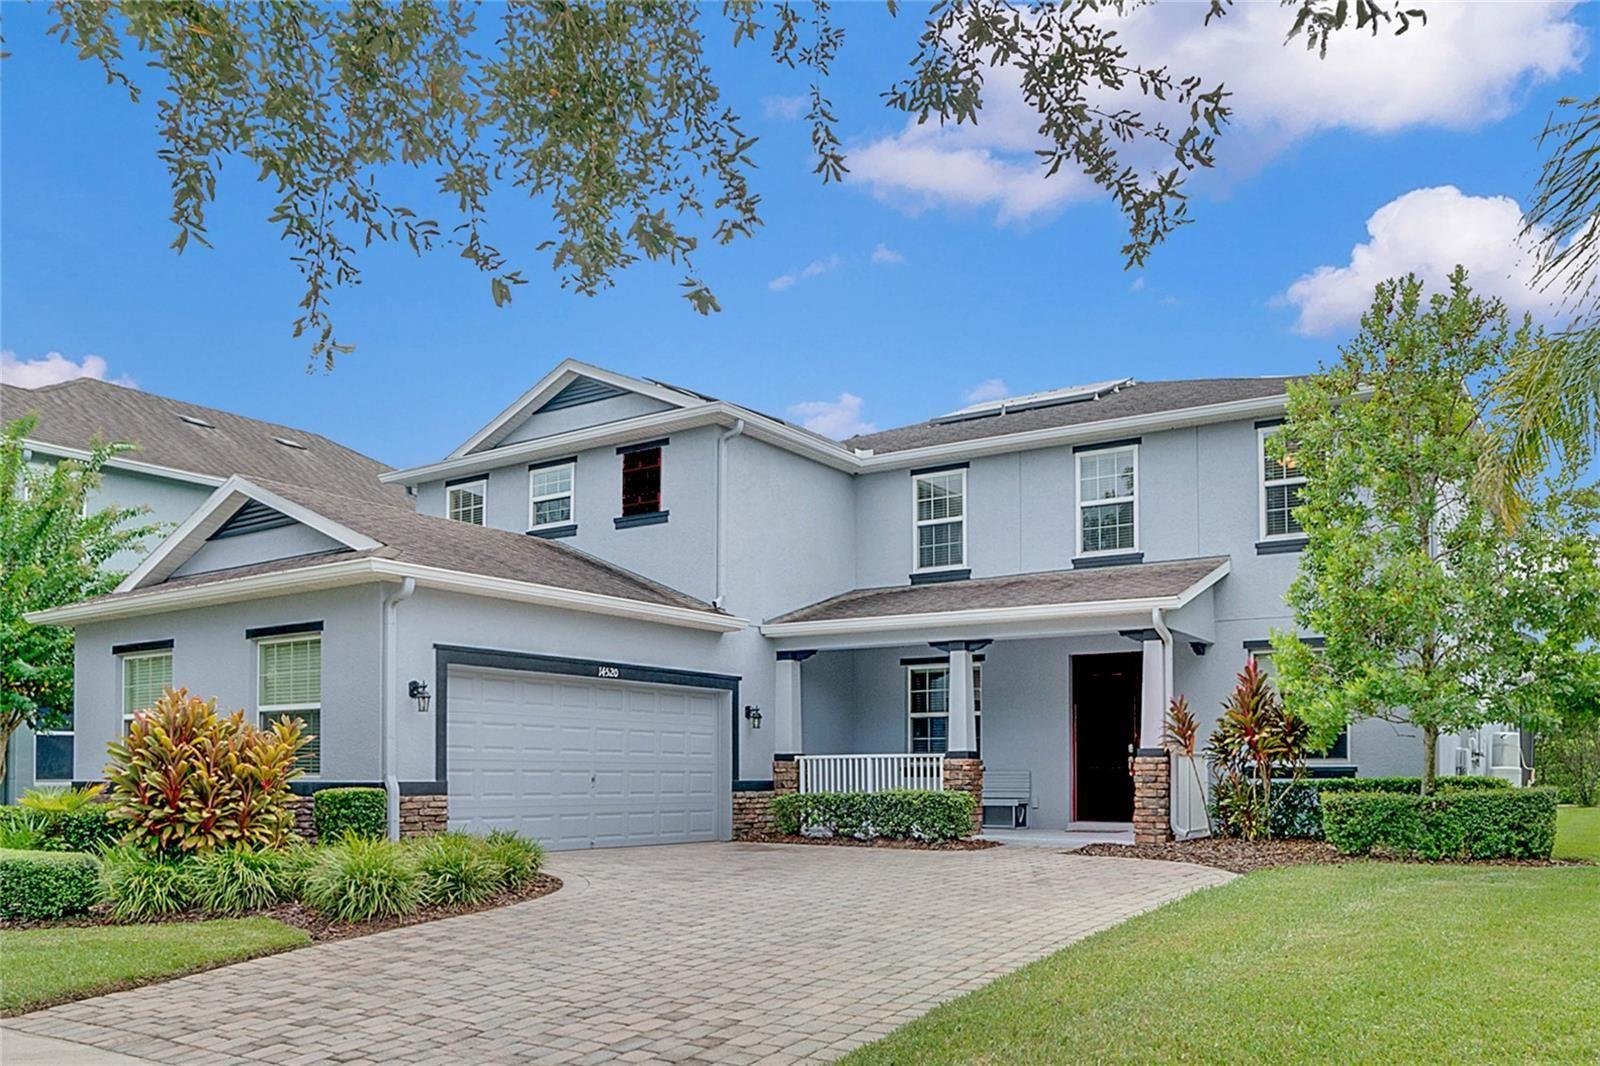 14520 PORTER ROAD, Winter Garden, FL 34787 - #: O5974984